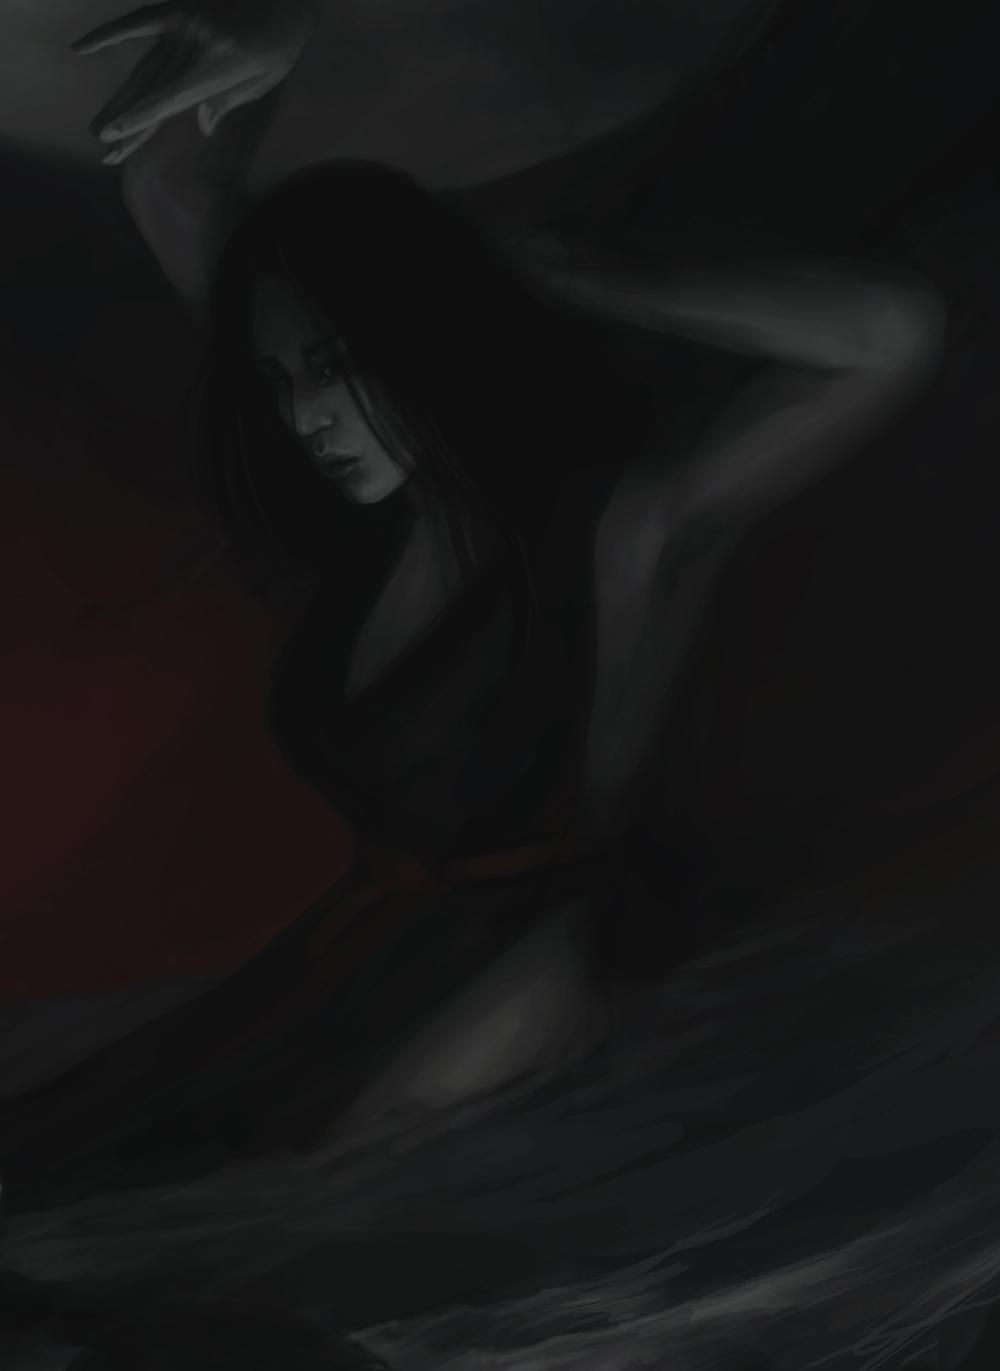 Jeszika_detail_siren1.jpg